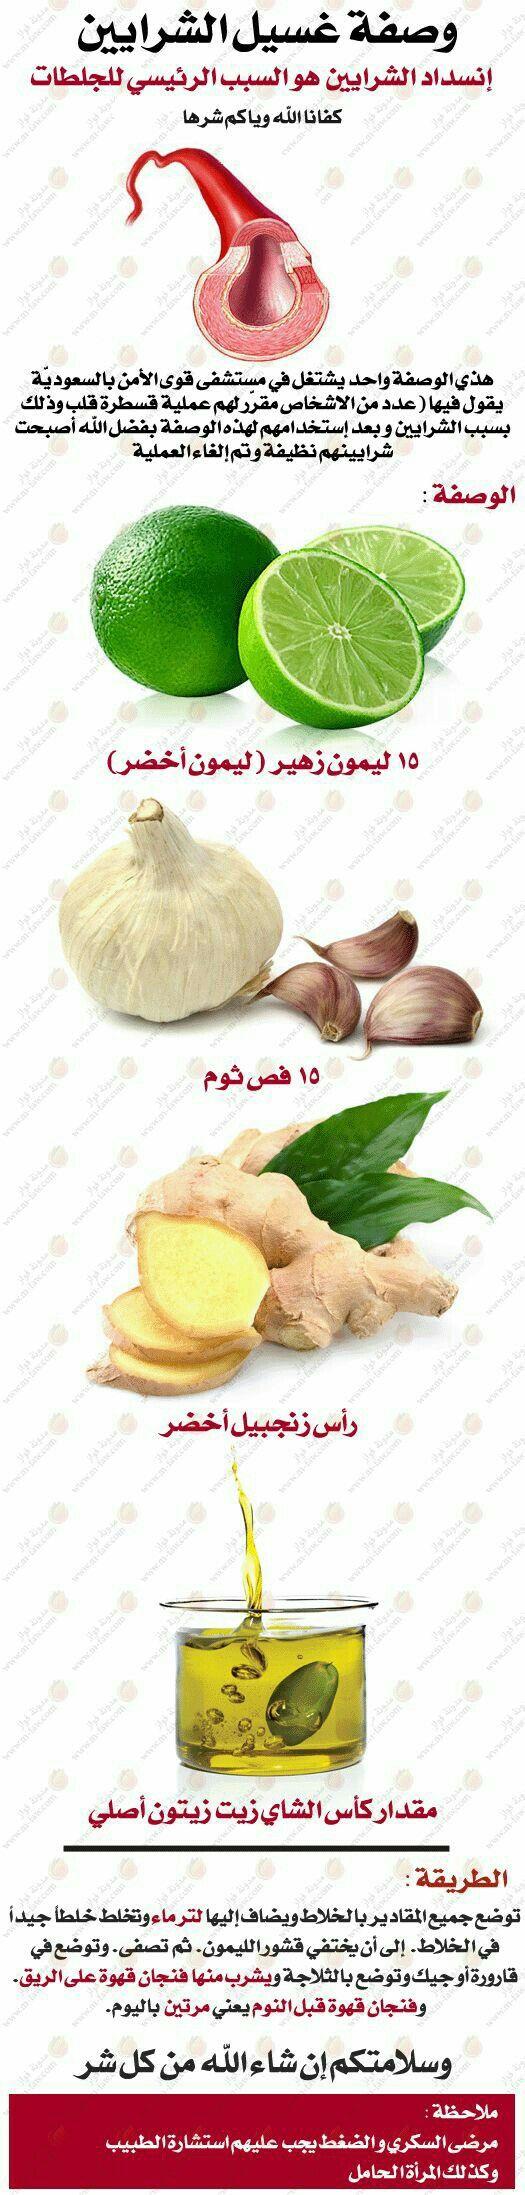 Caftan Morrocco Jellaba Caftan D Or Health Fitness Nutrition Health And Nutrition Organic Health